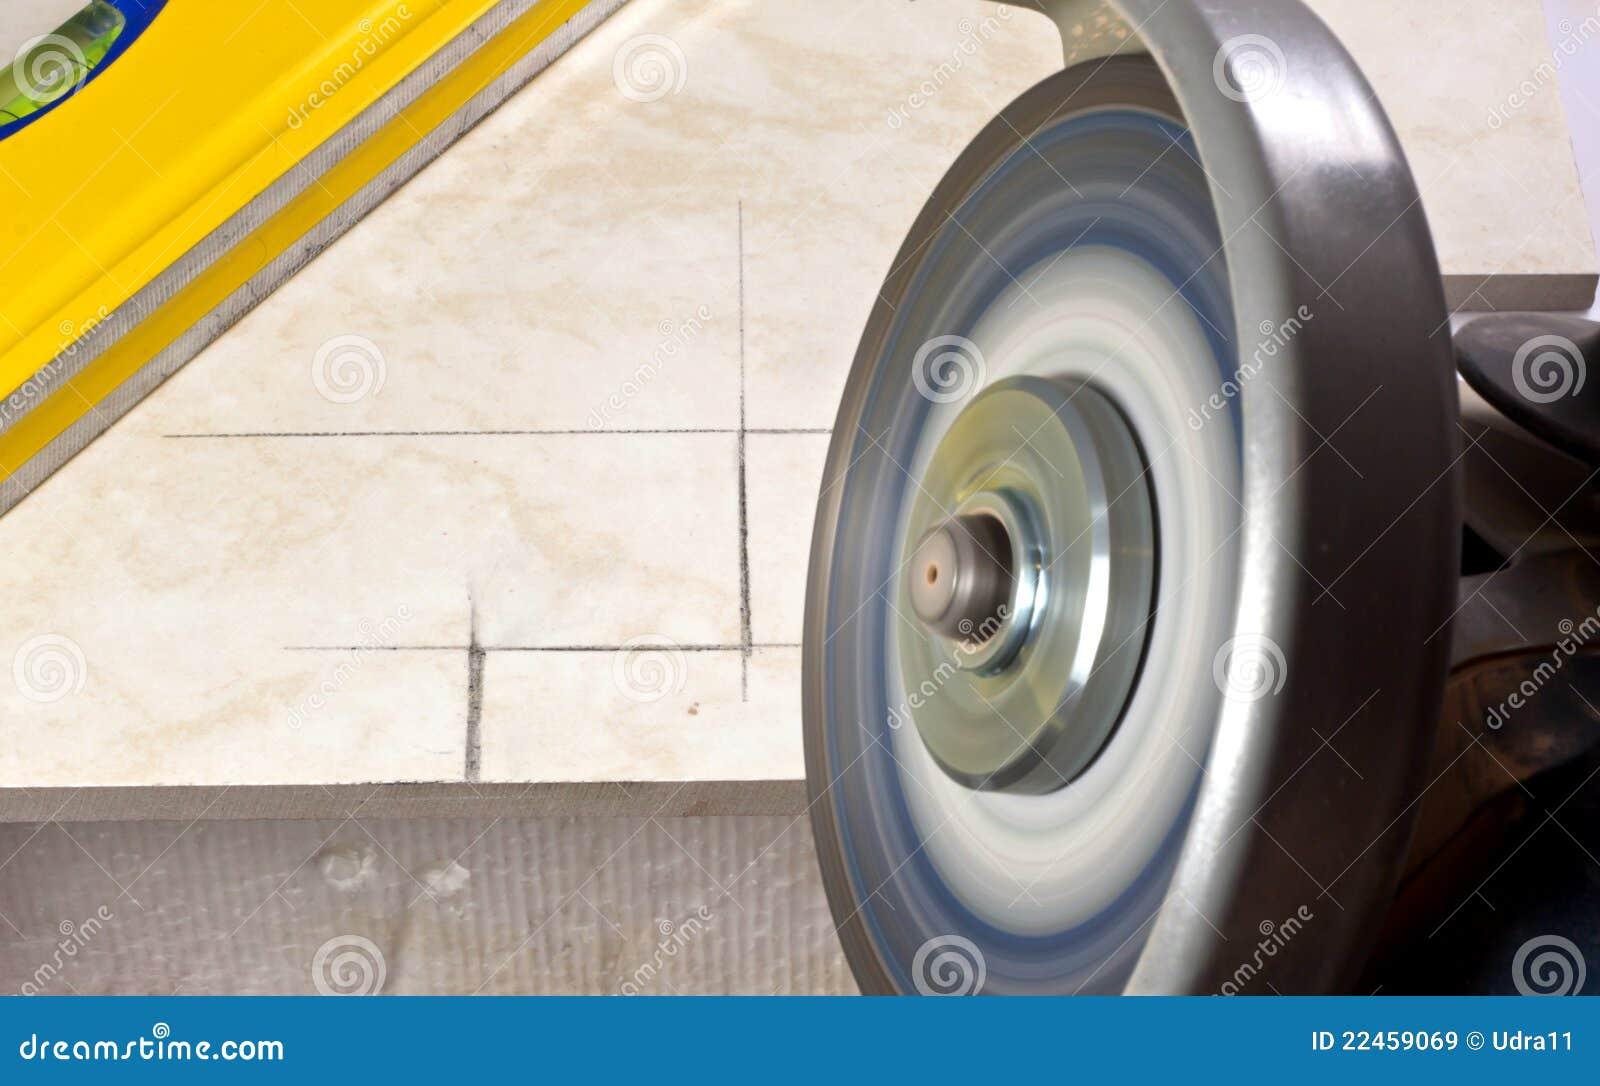 Tiler Cutting Tile Angle Grinder Stock Image Image Of Workman